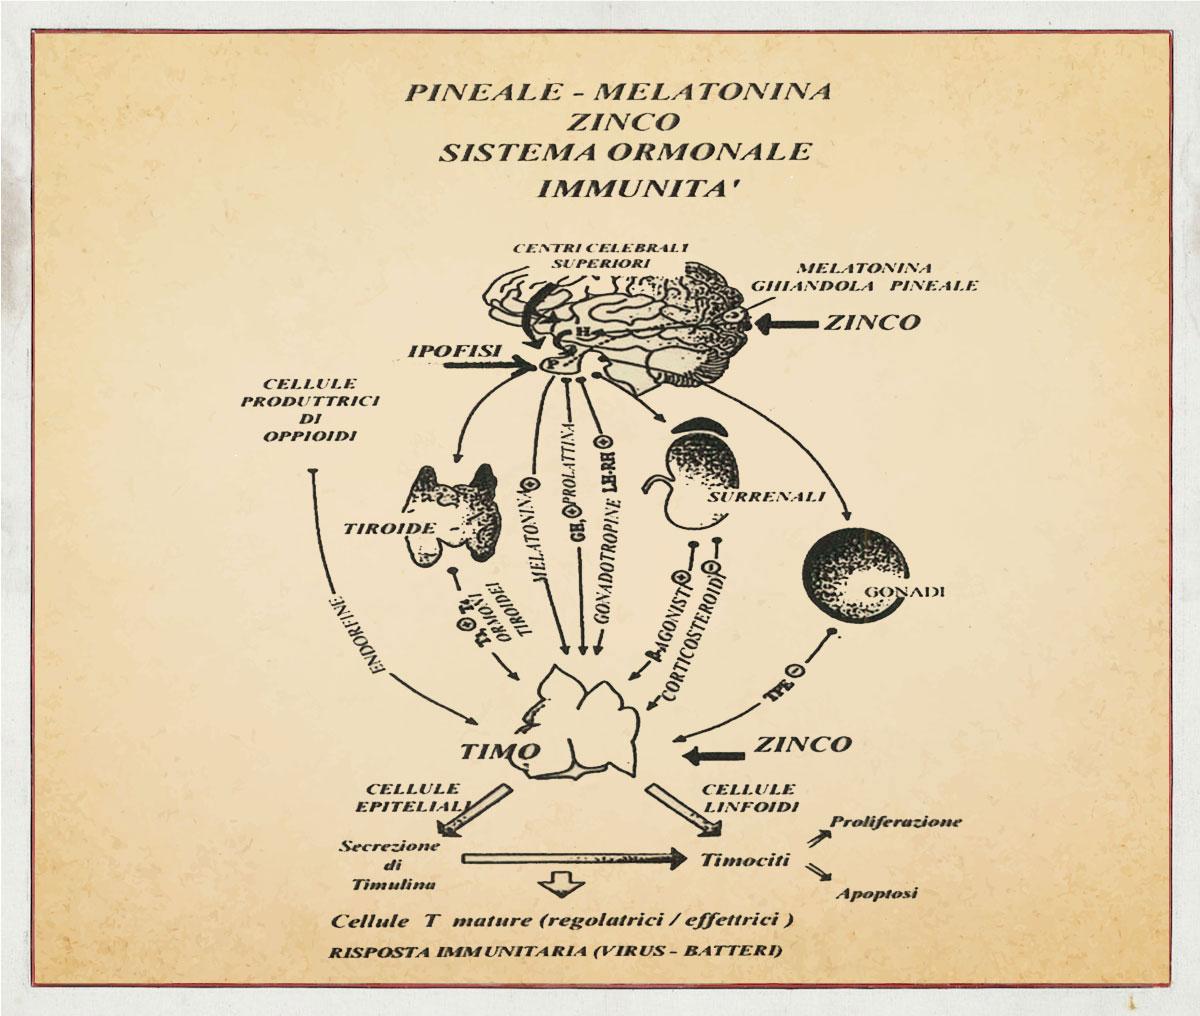 Walter Pierpaoli, pubblicazione su Psychoneuroimmunology, Academic Press, NY 1981